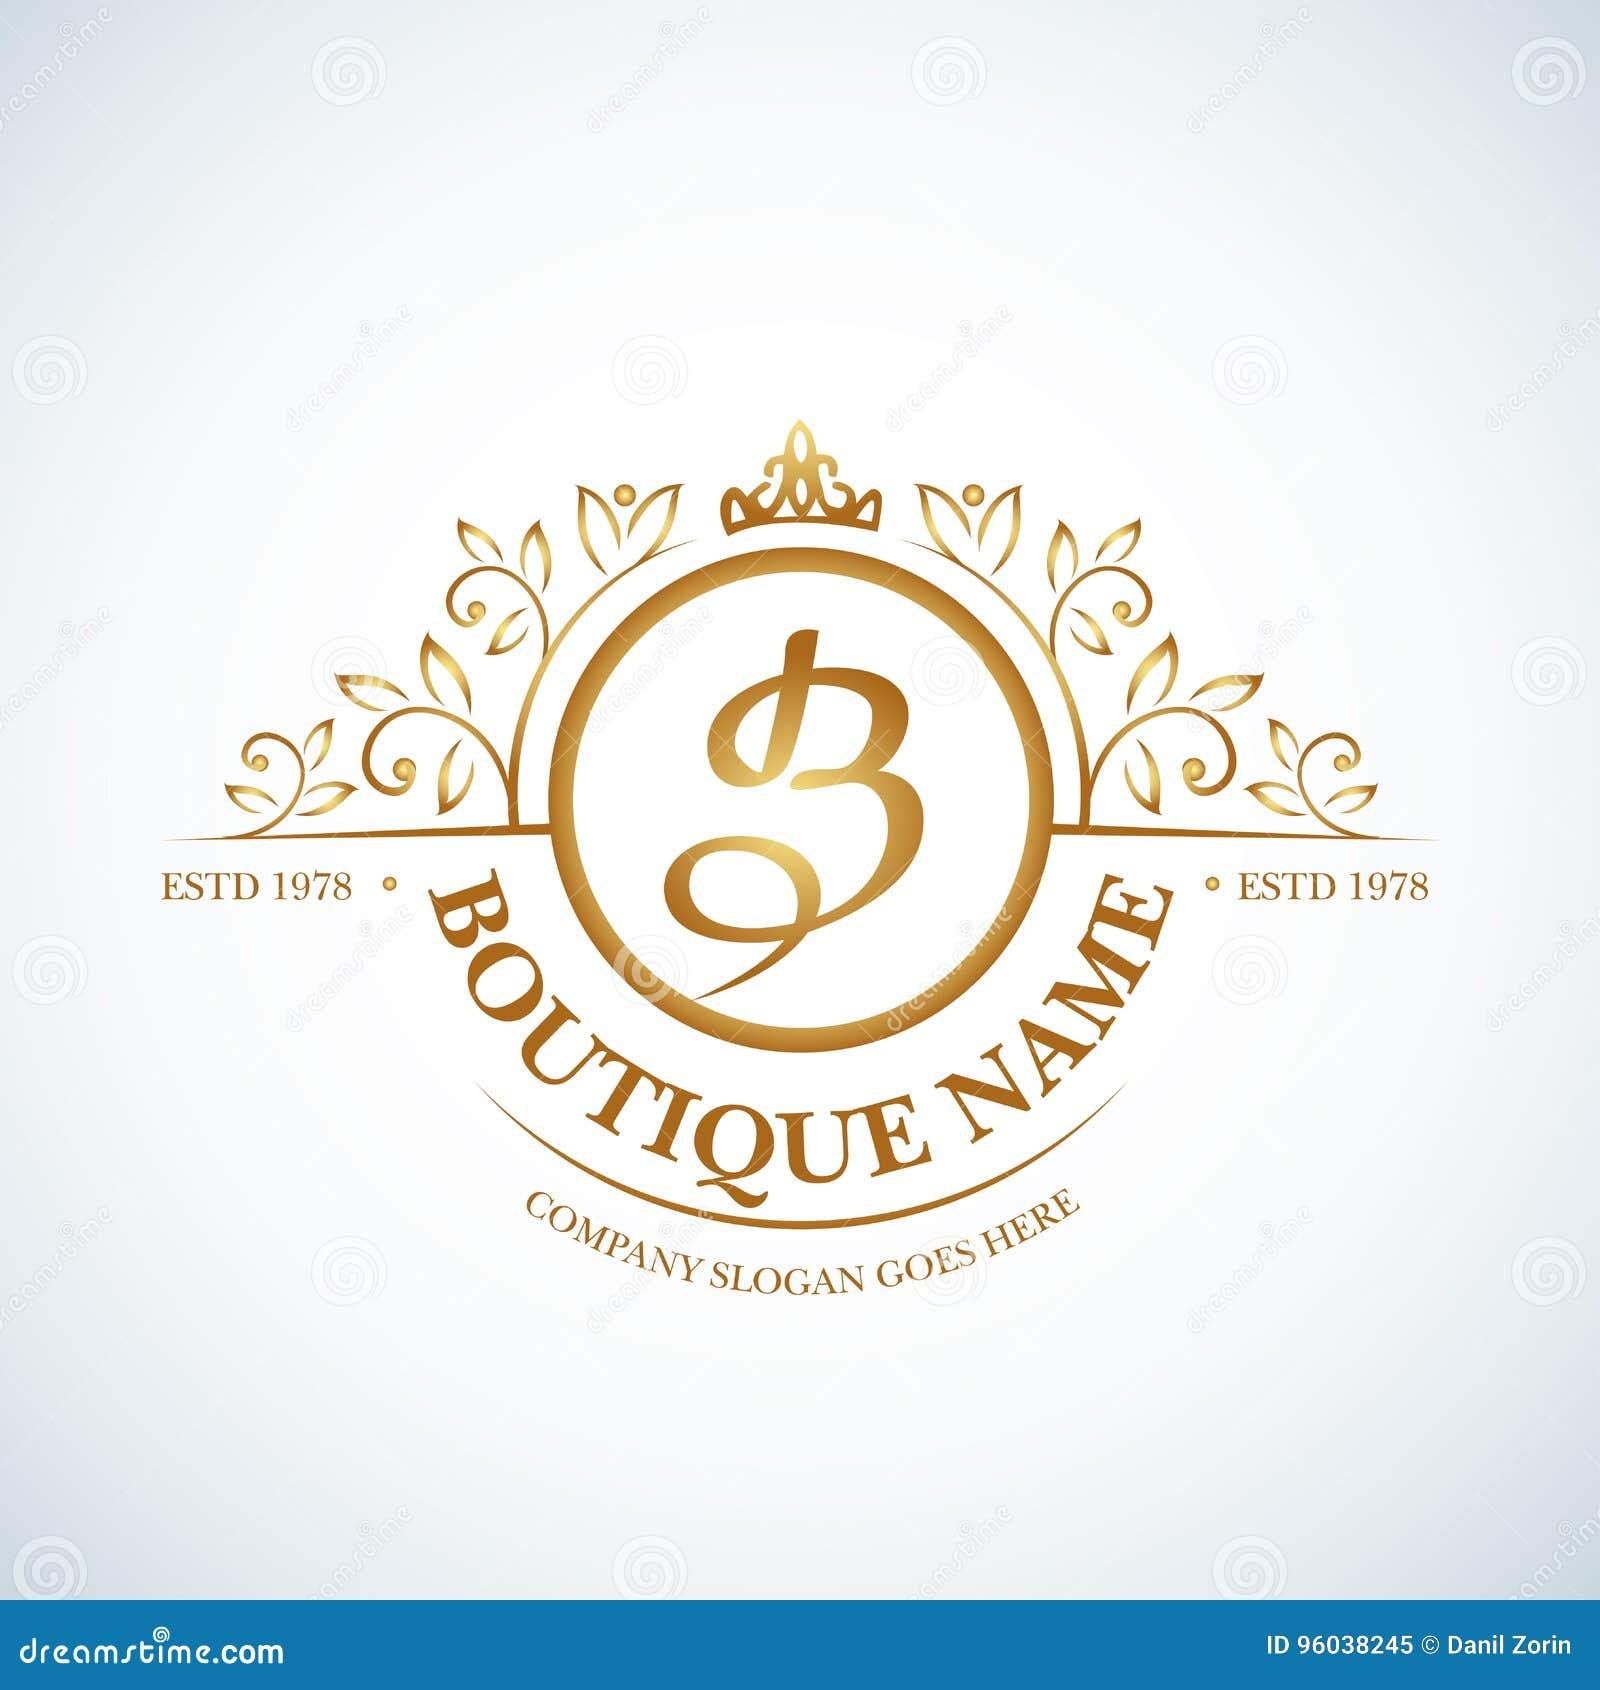 Calligraphic Elegant Line Art Logo Design. Letter Emblem B. Business ...